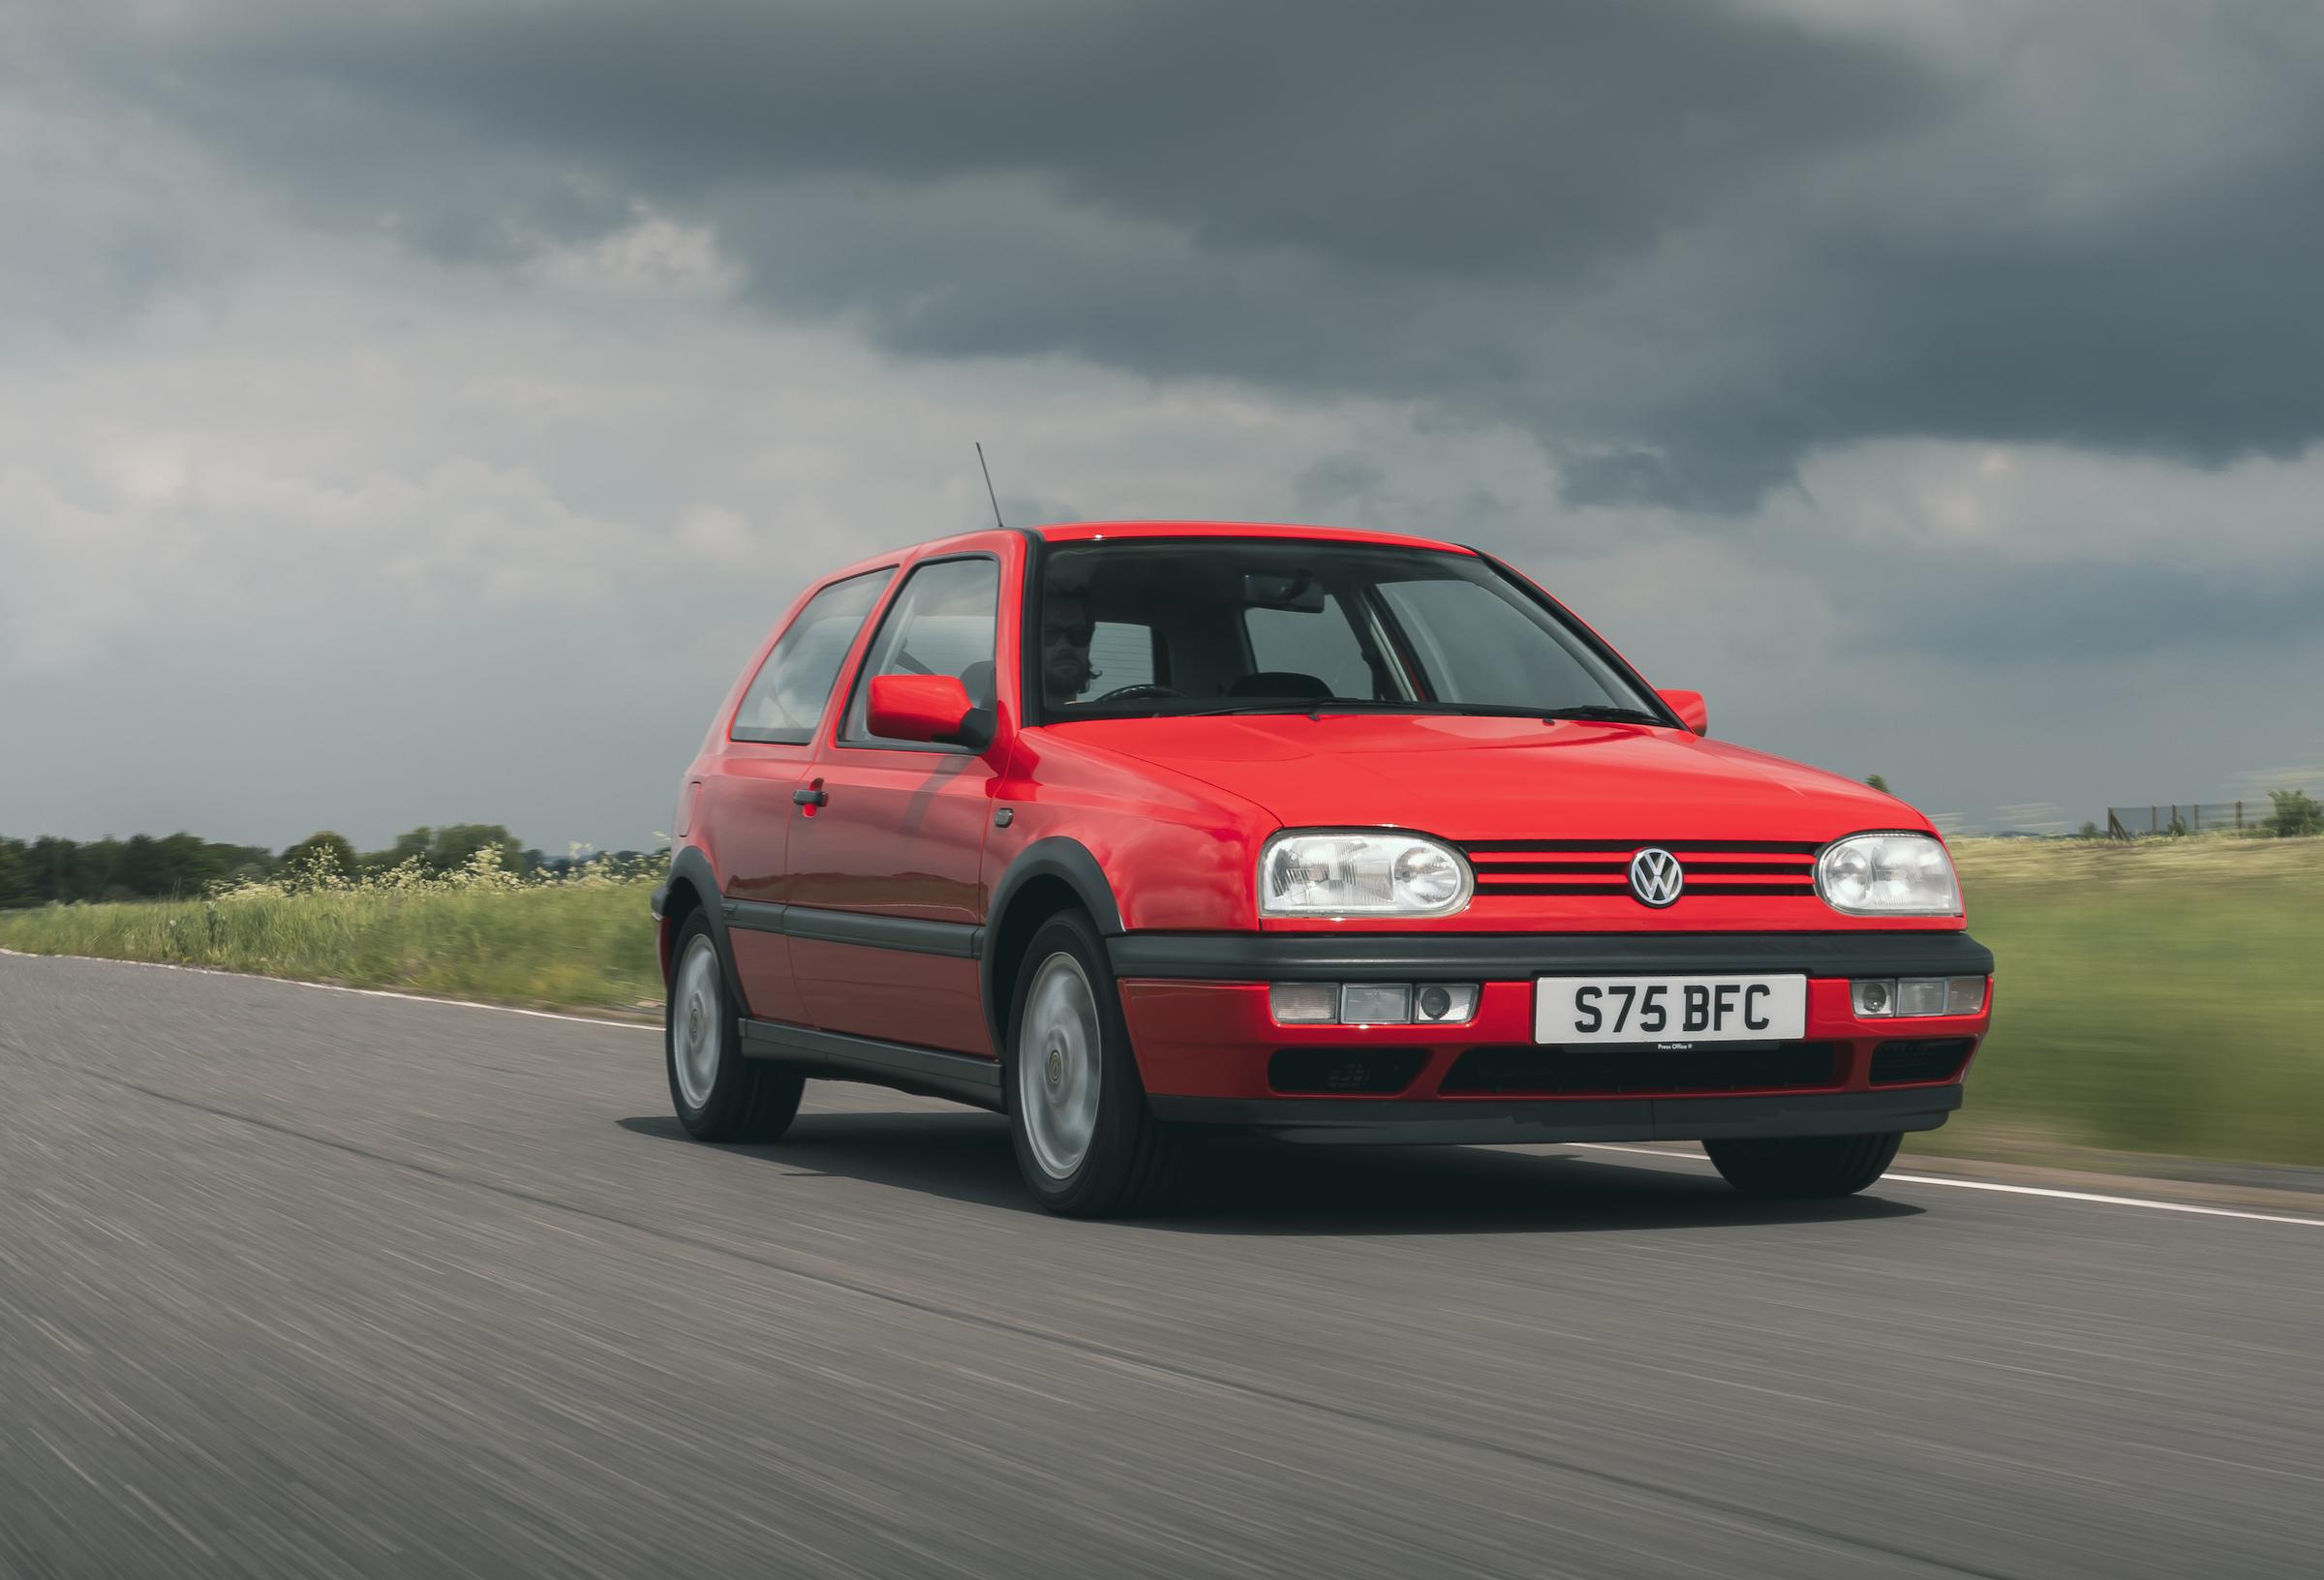 The Mk3 Volkswagen Golf GTI is not as bad as we're told